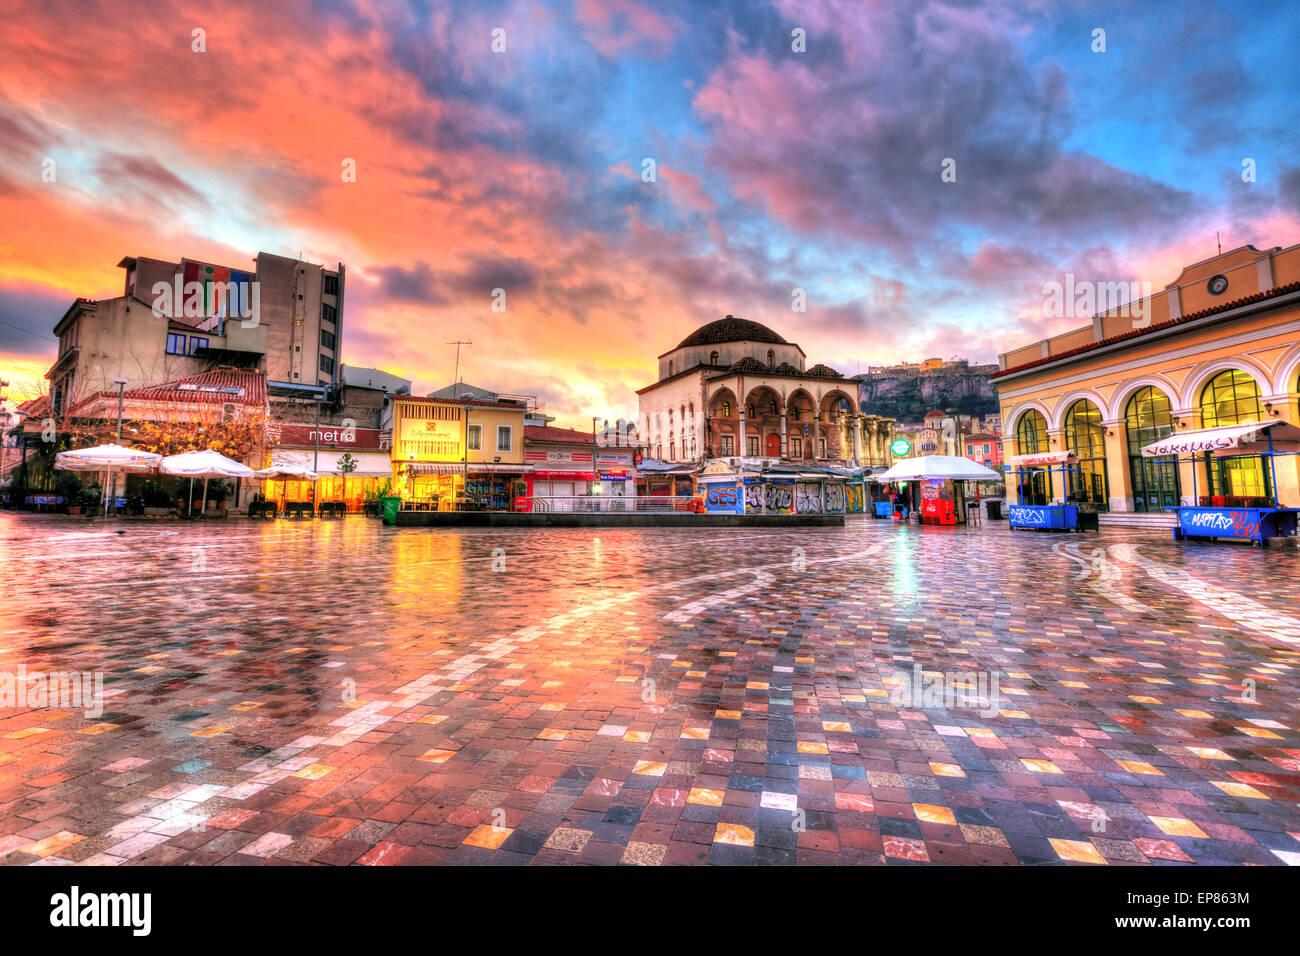 Monastiraki square early in the morning - Stock Image